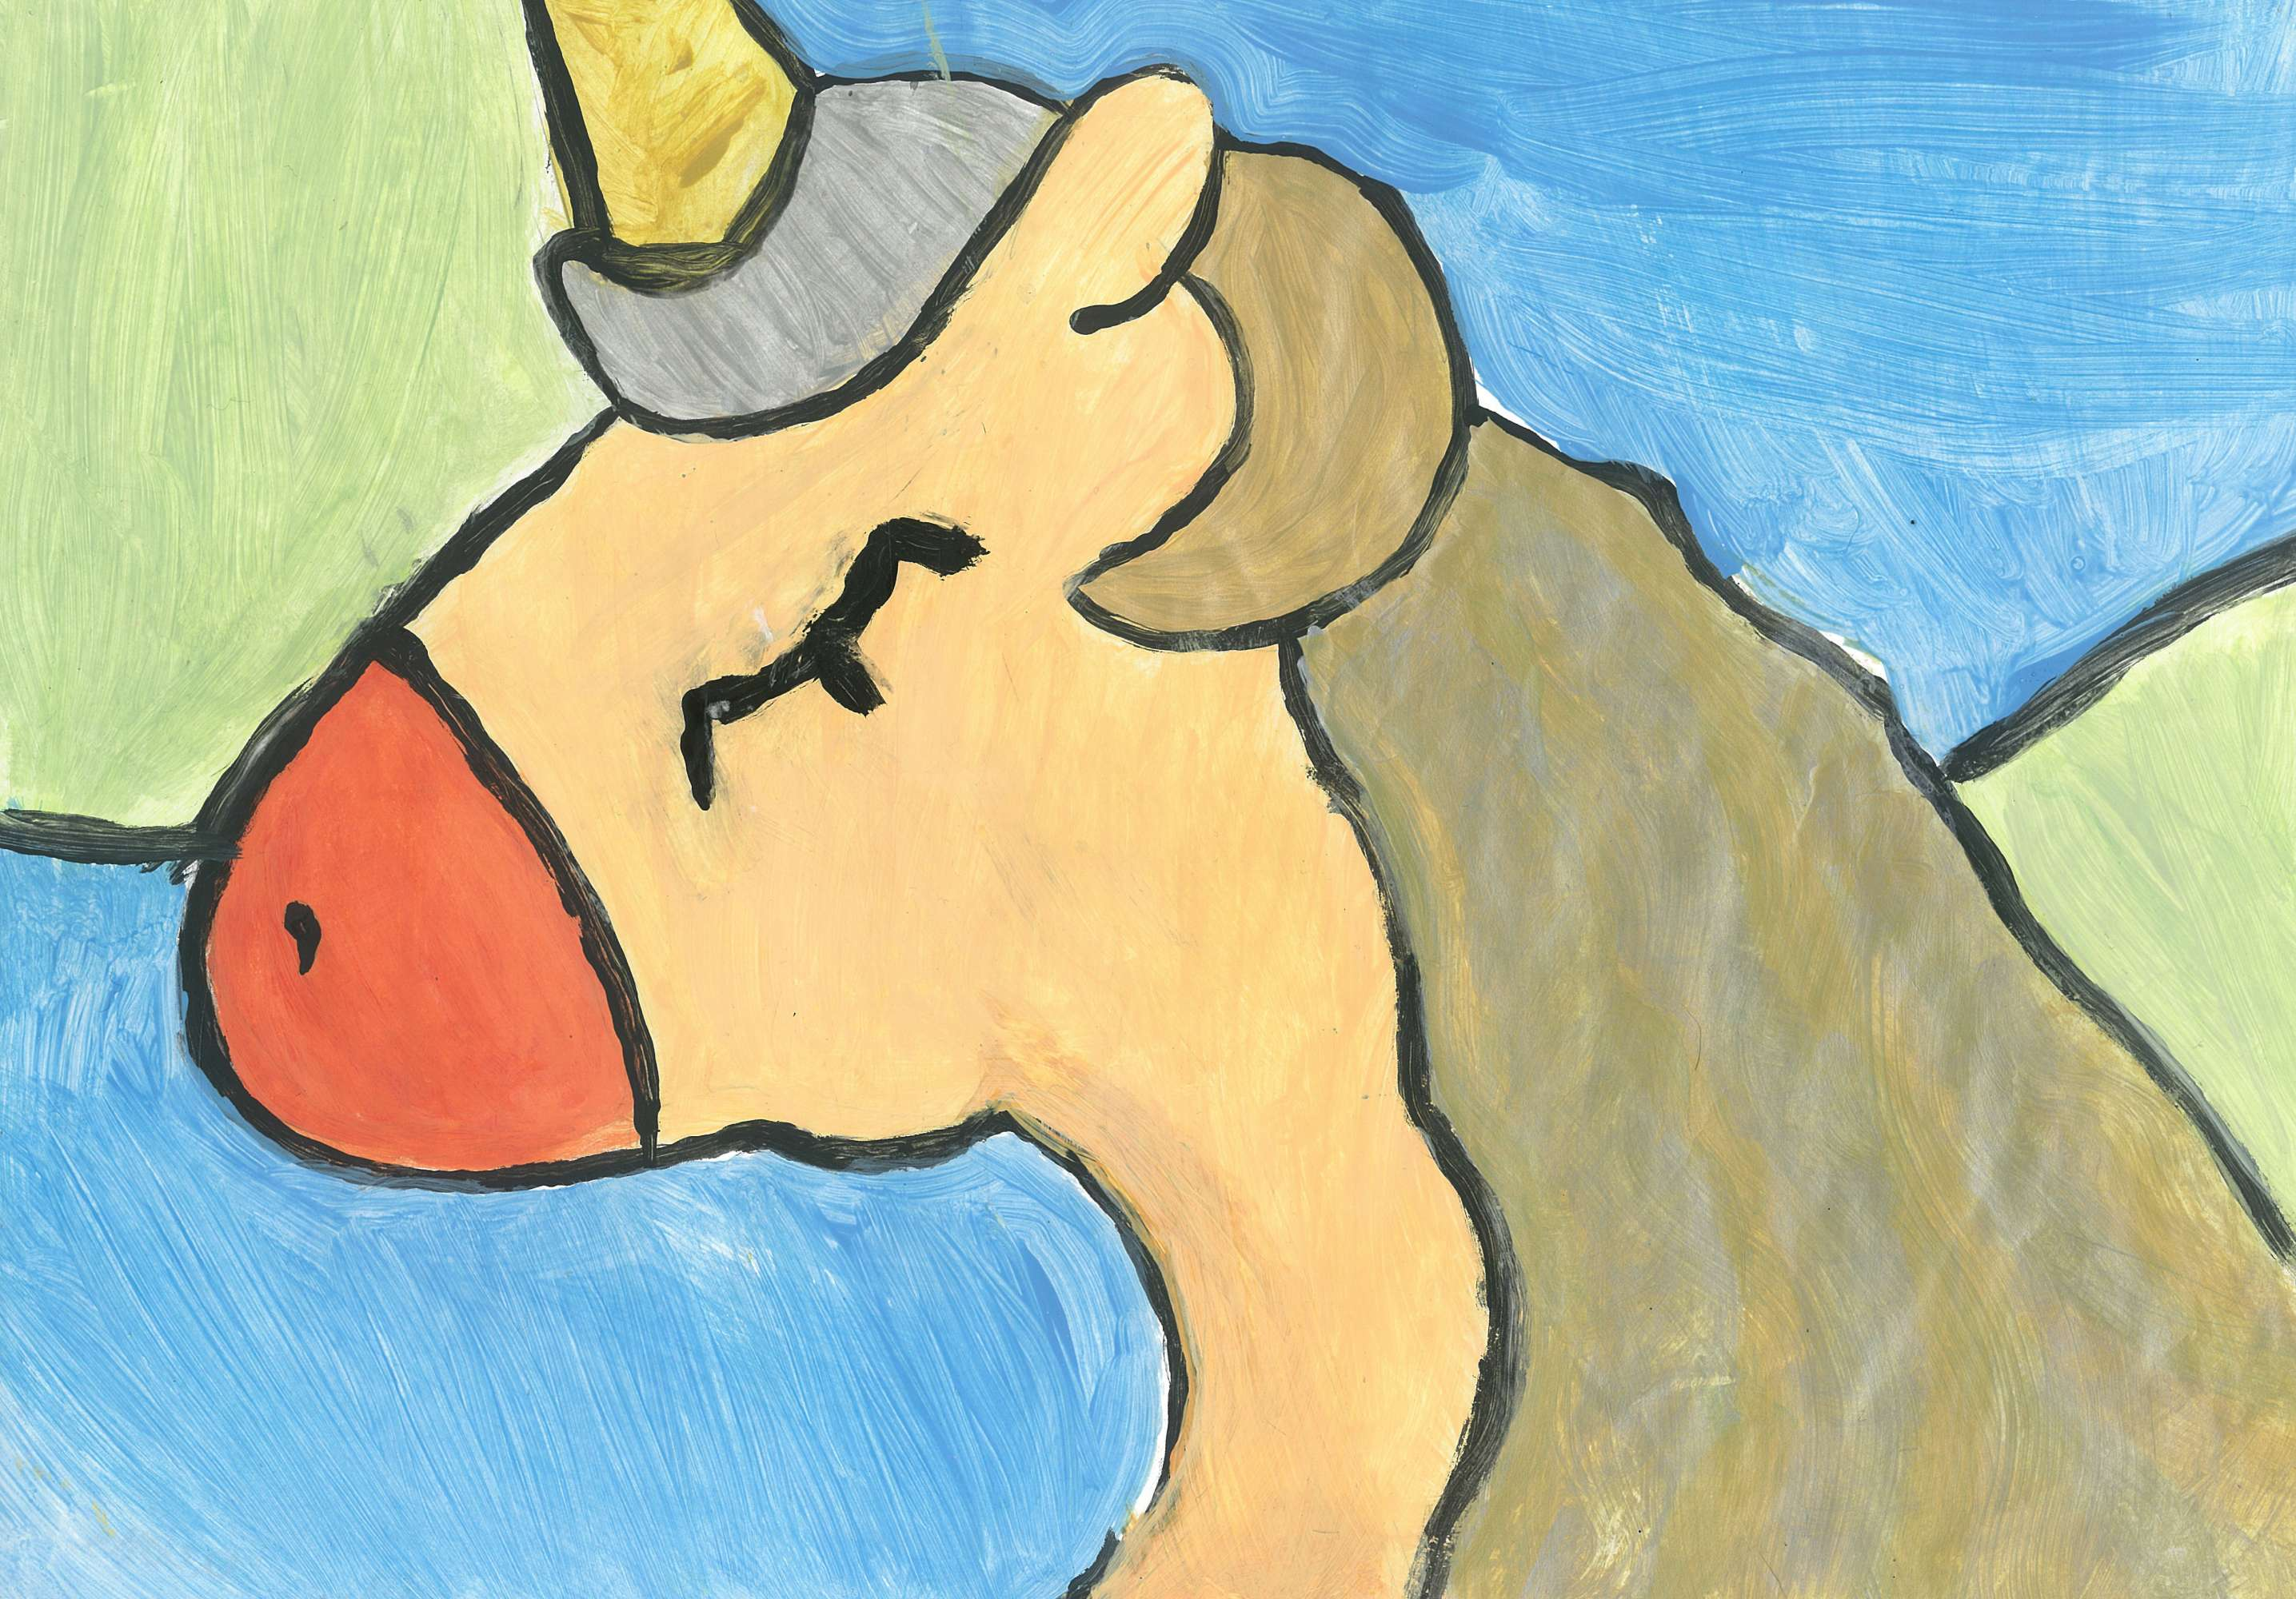 The Peach Unicorn